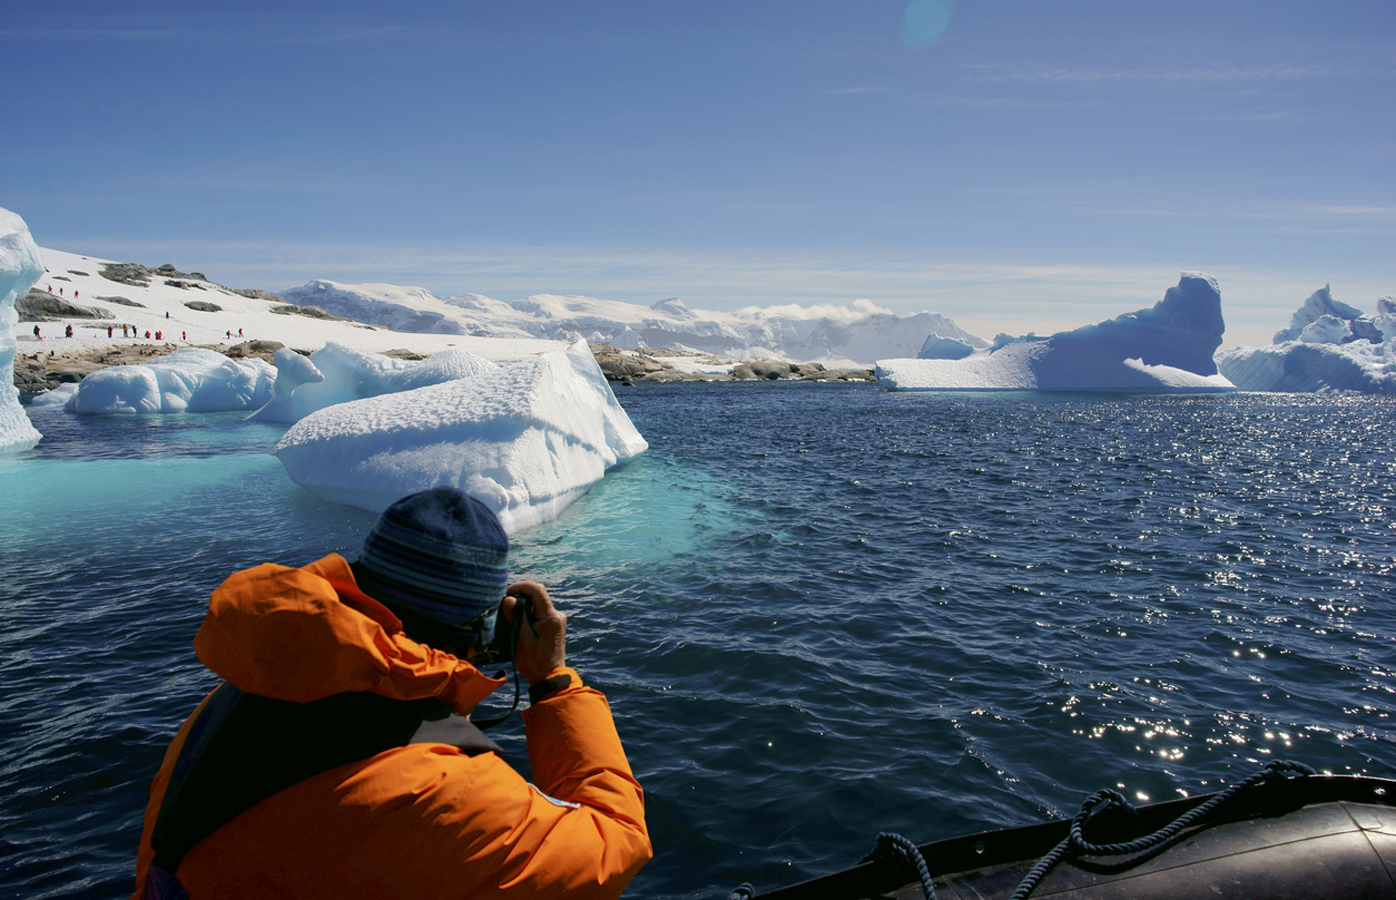 Tourist viewing an iceberg in Antarctica